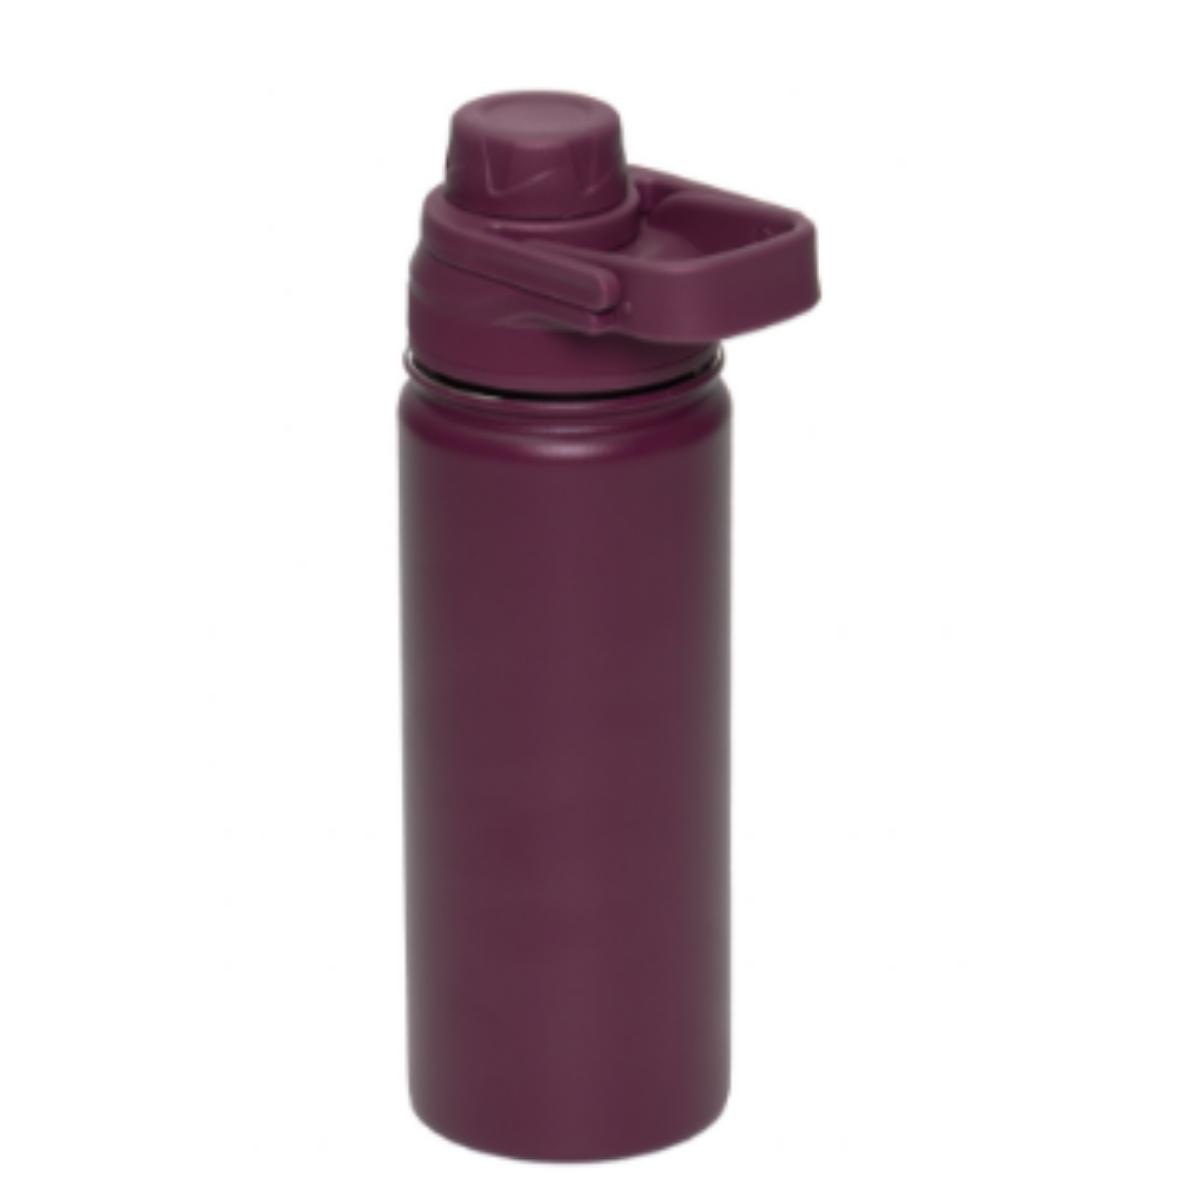 Garrafa Termica Vinho Hydra 500ml - Pacco  - KFit Nutrition